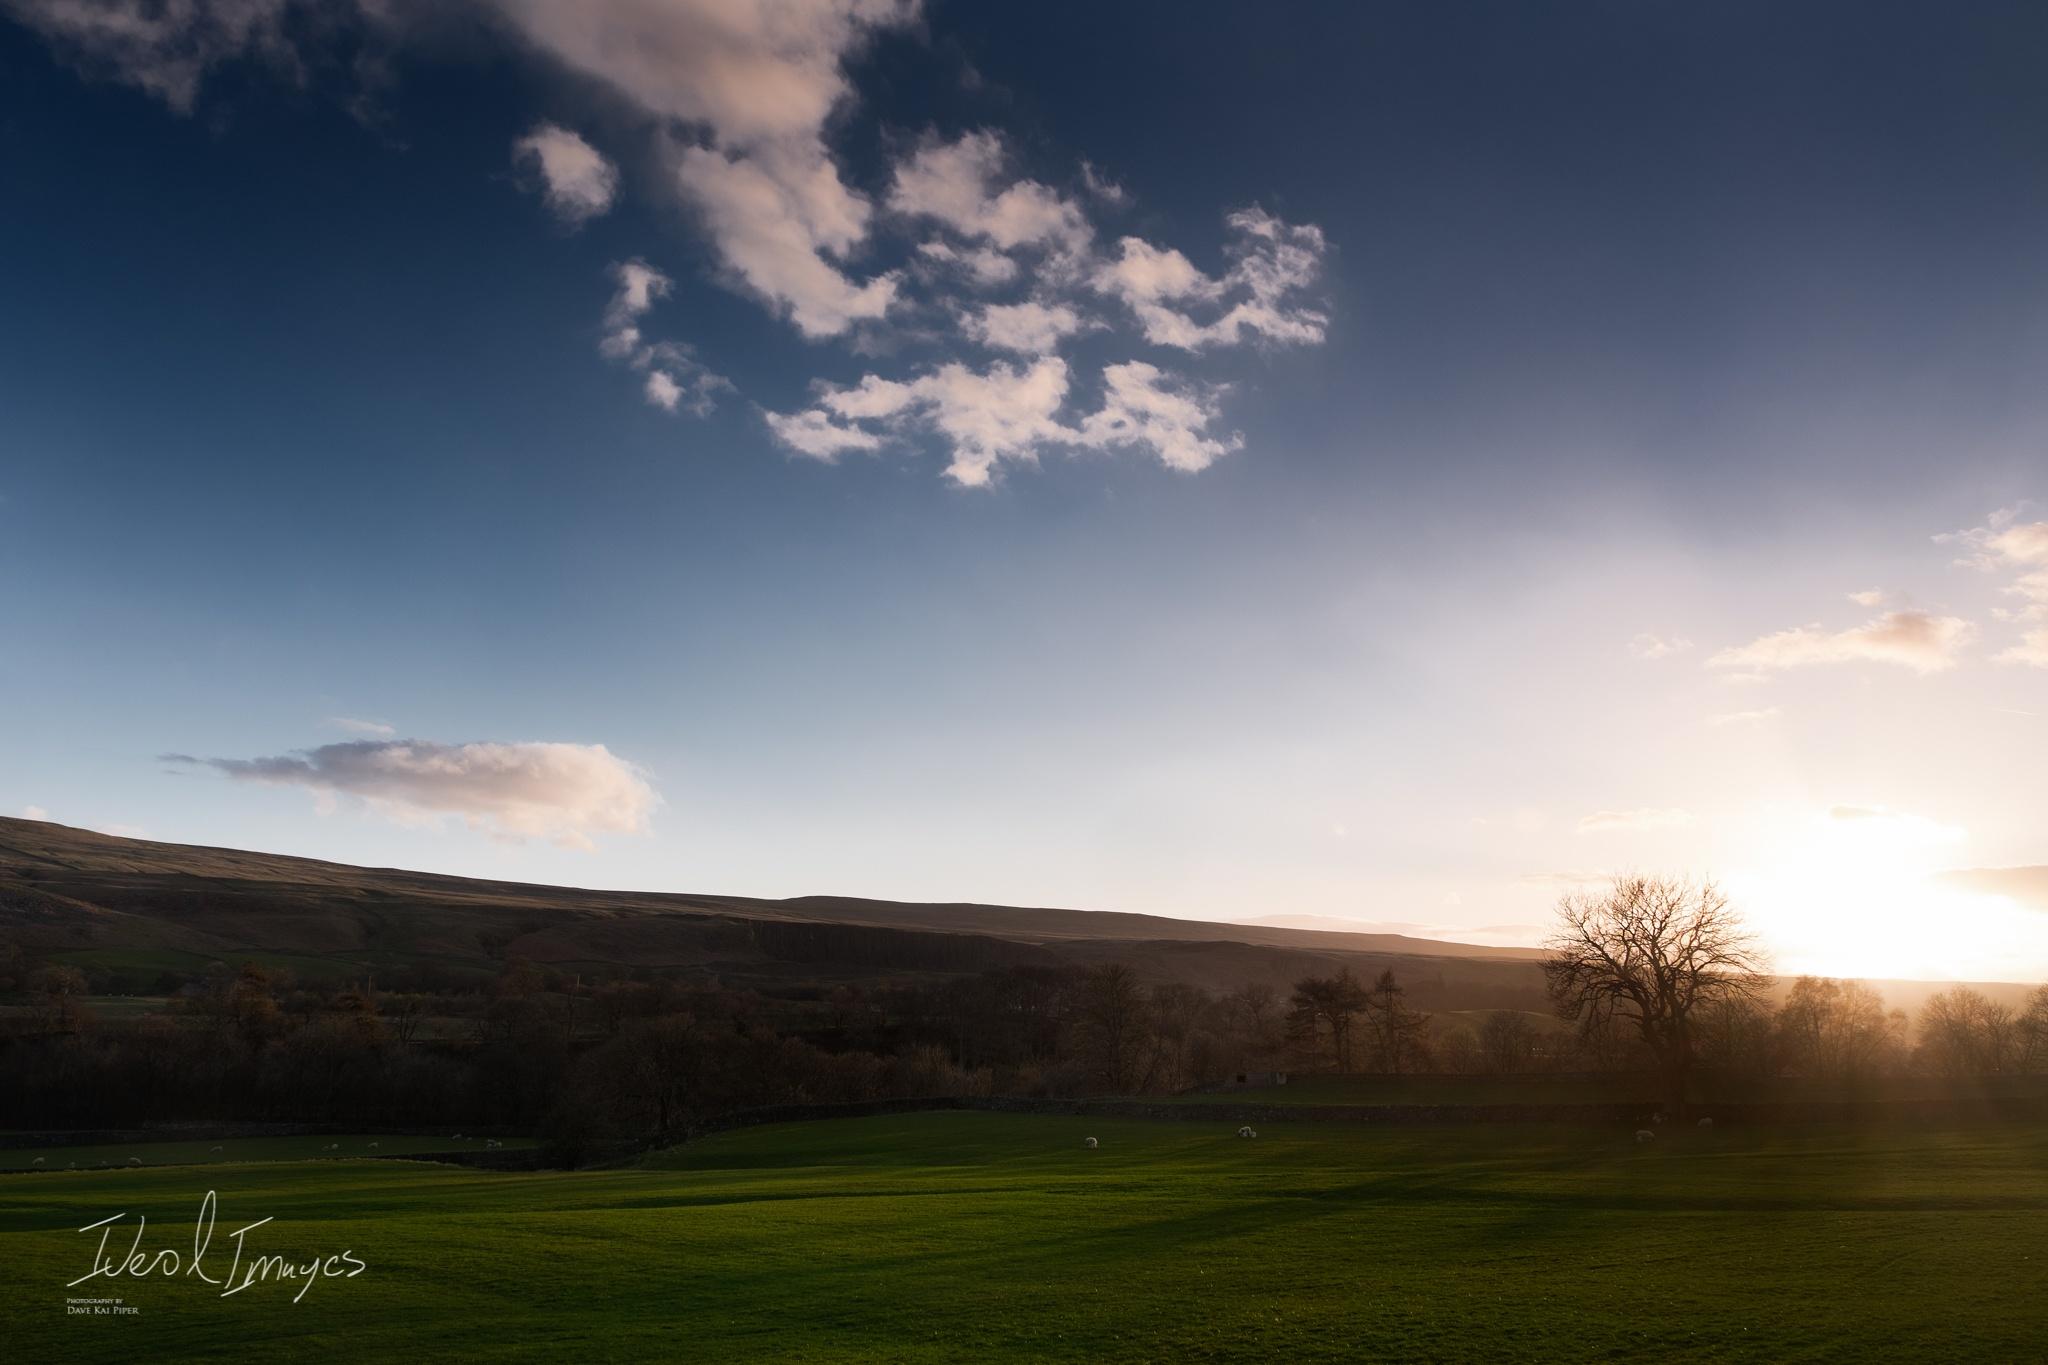 Landscape images taken near Barnard's Castle